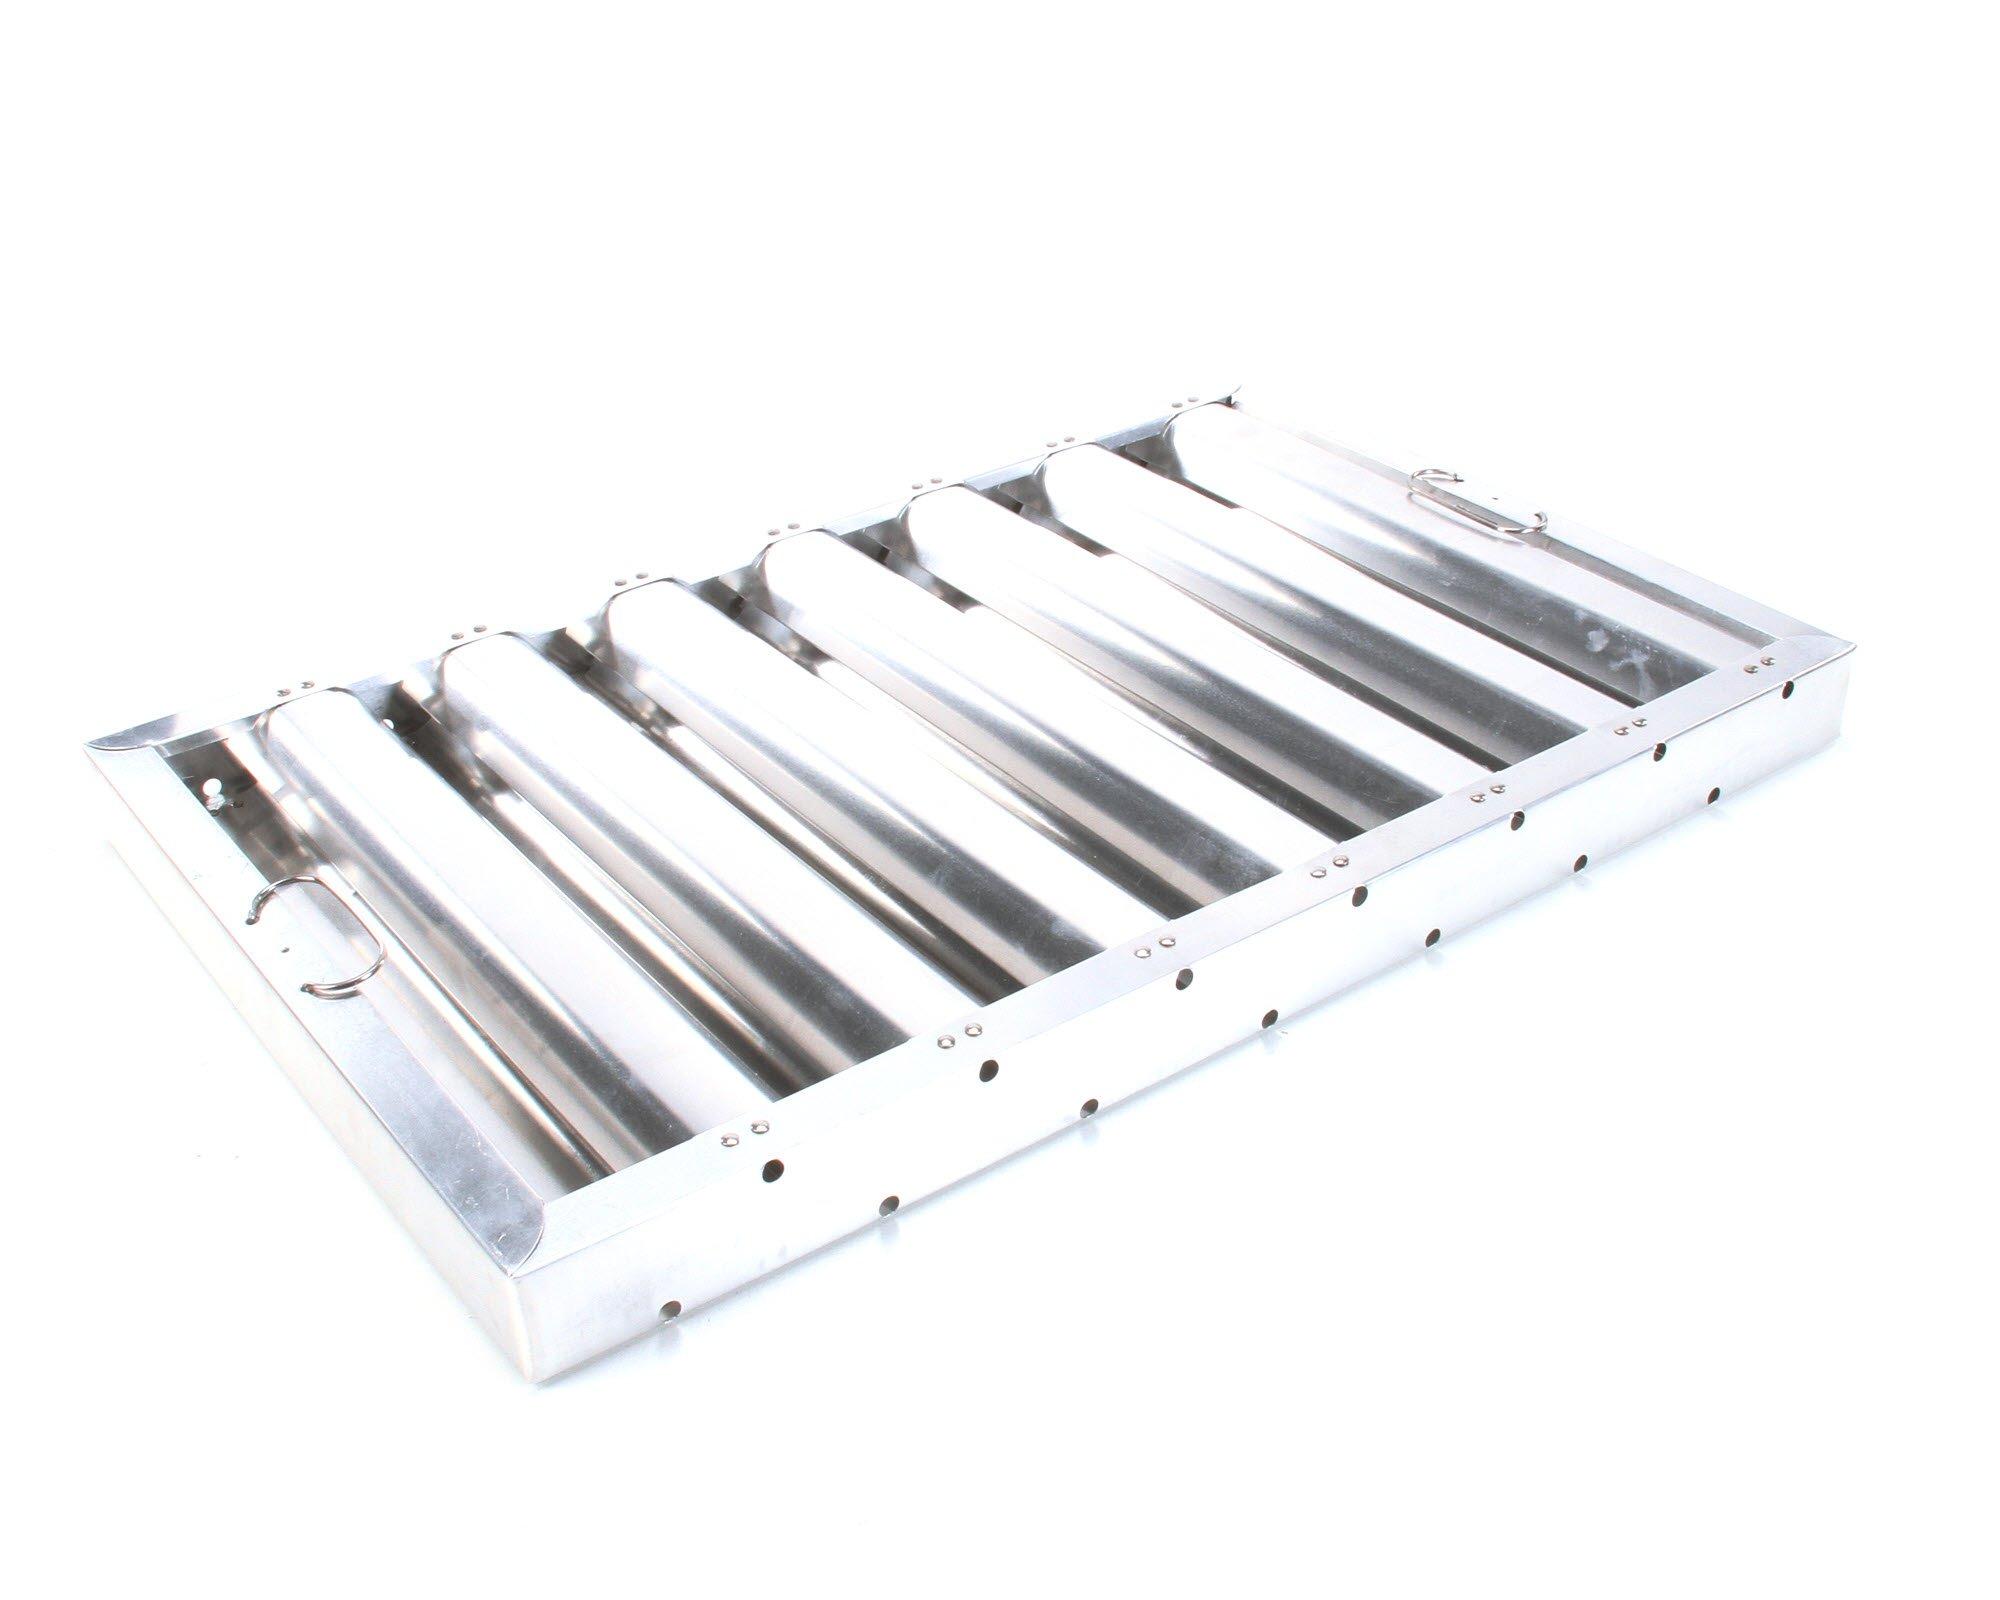 Component Hardware FA51-1625 Type 6 Aluminum Grease Filter, 16-Inch x 25-Inch by Component Hardware (Image #1)